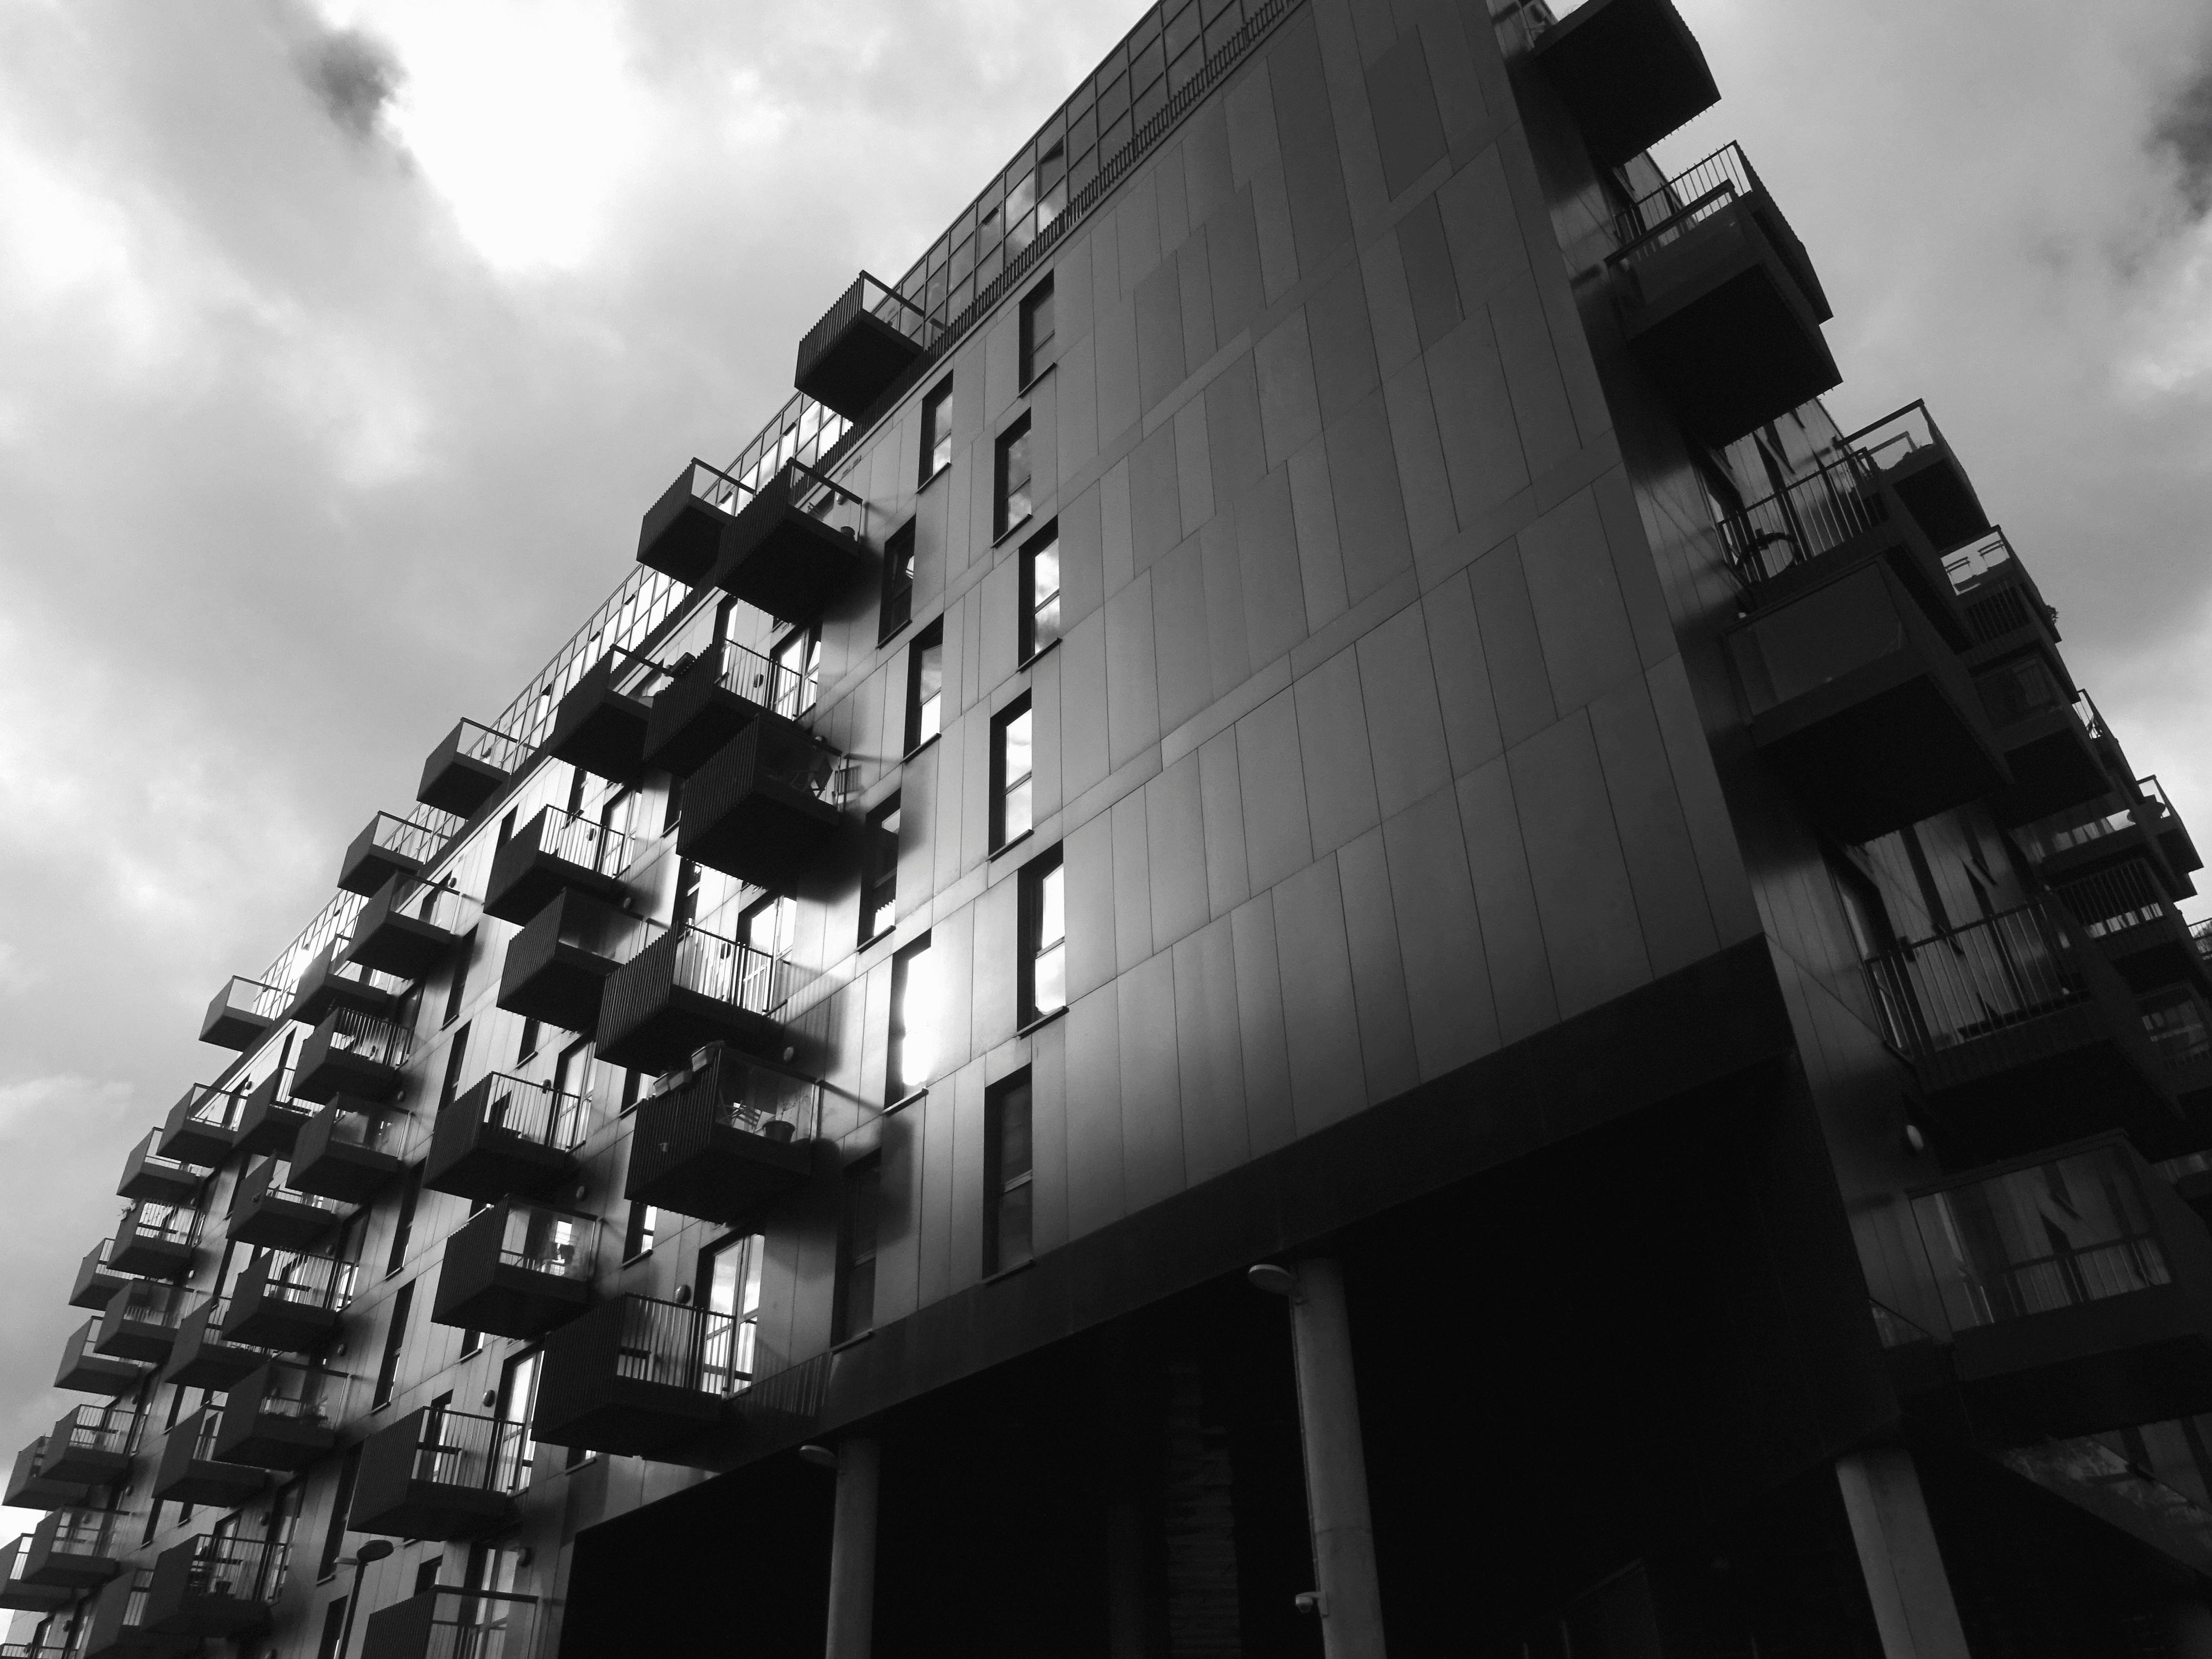 Imagen Gratis Edificio Arquitectura Fachada Terraza